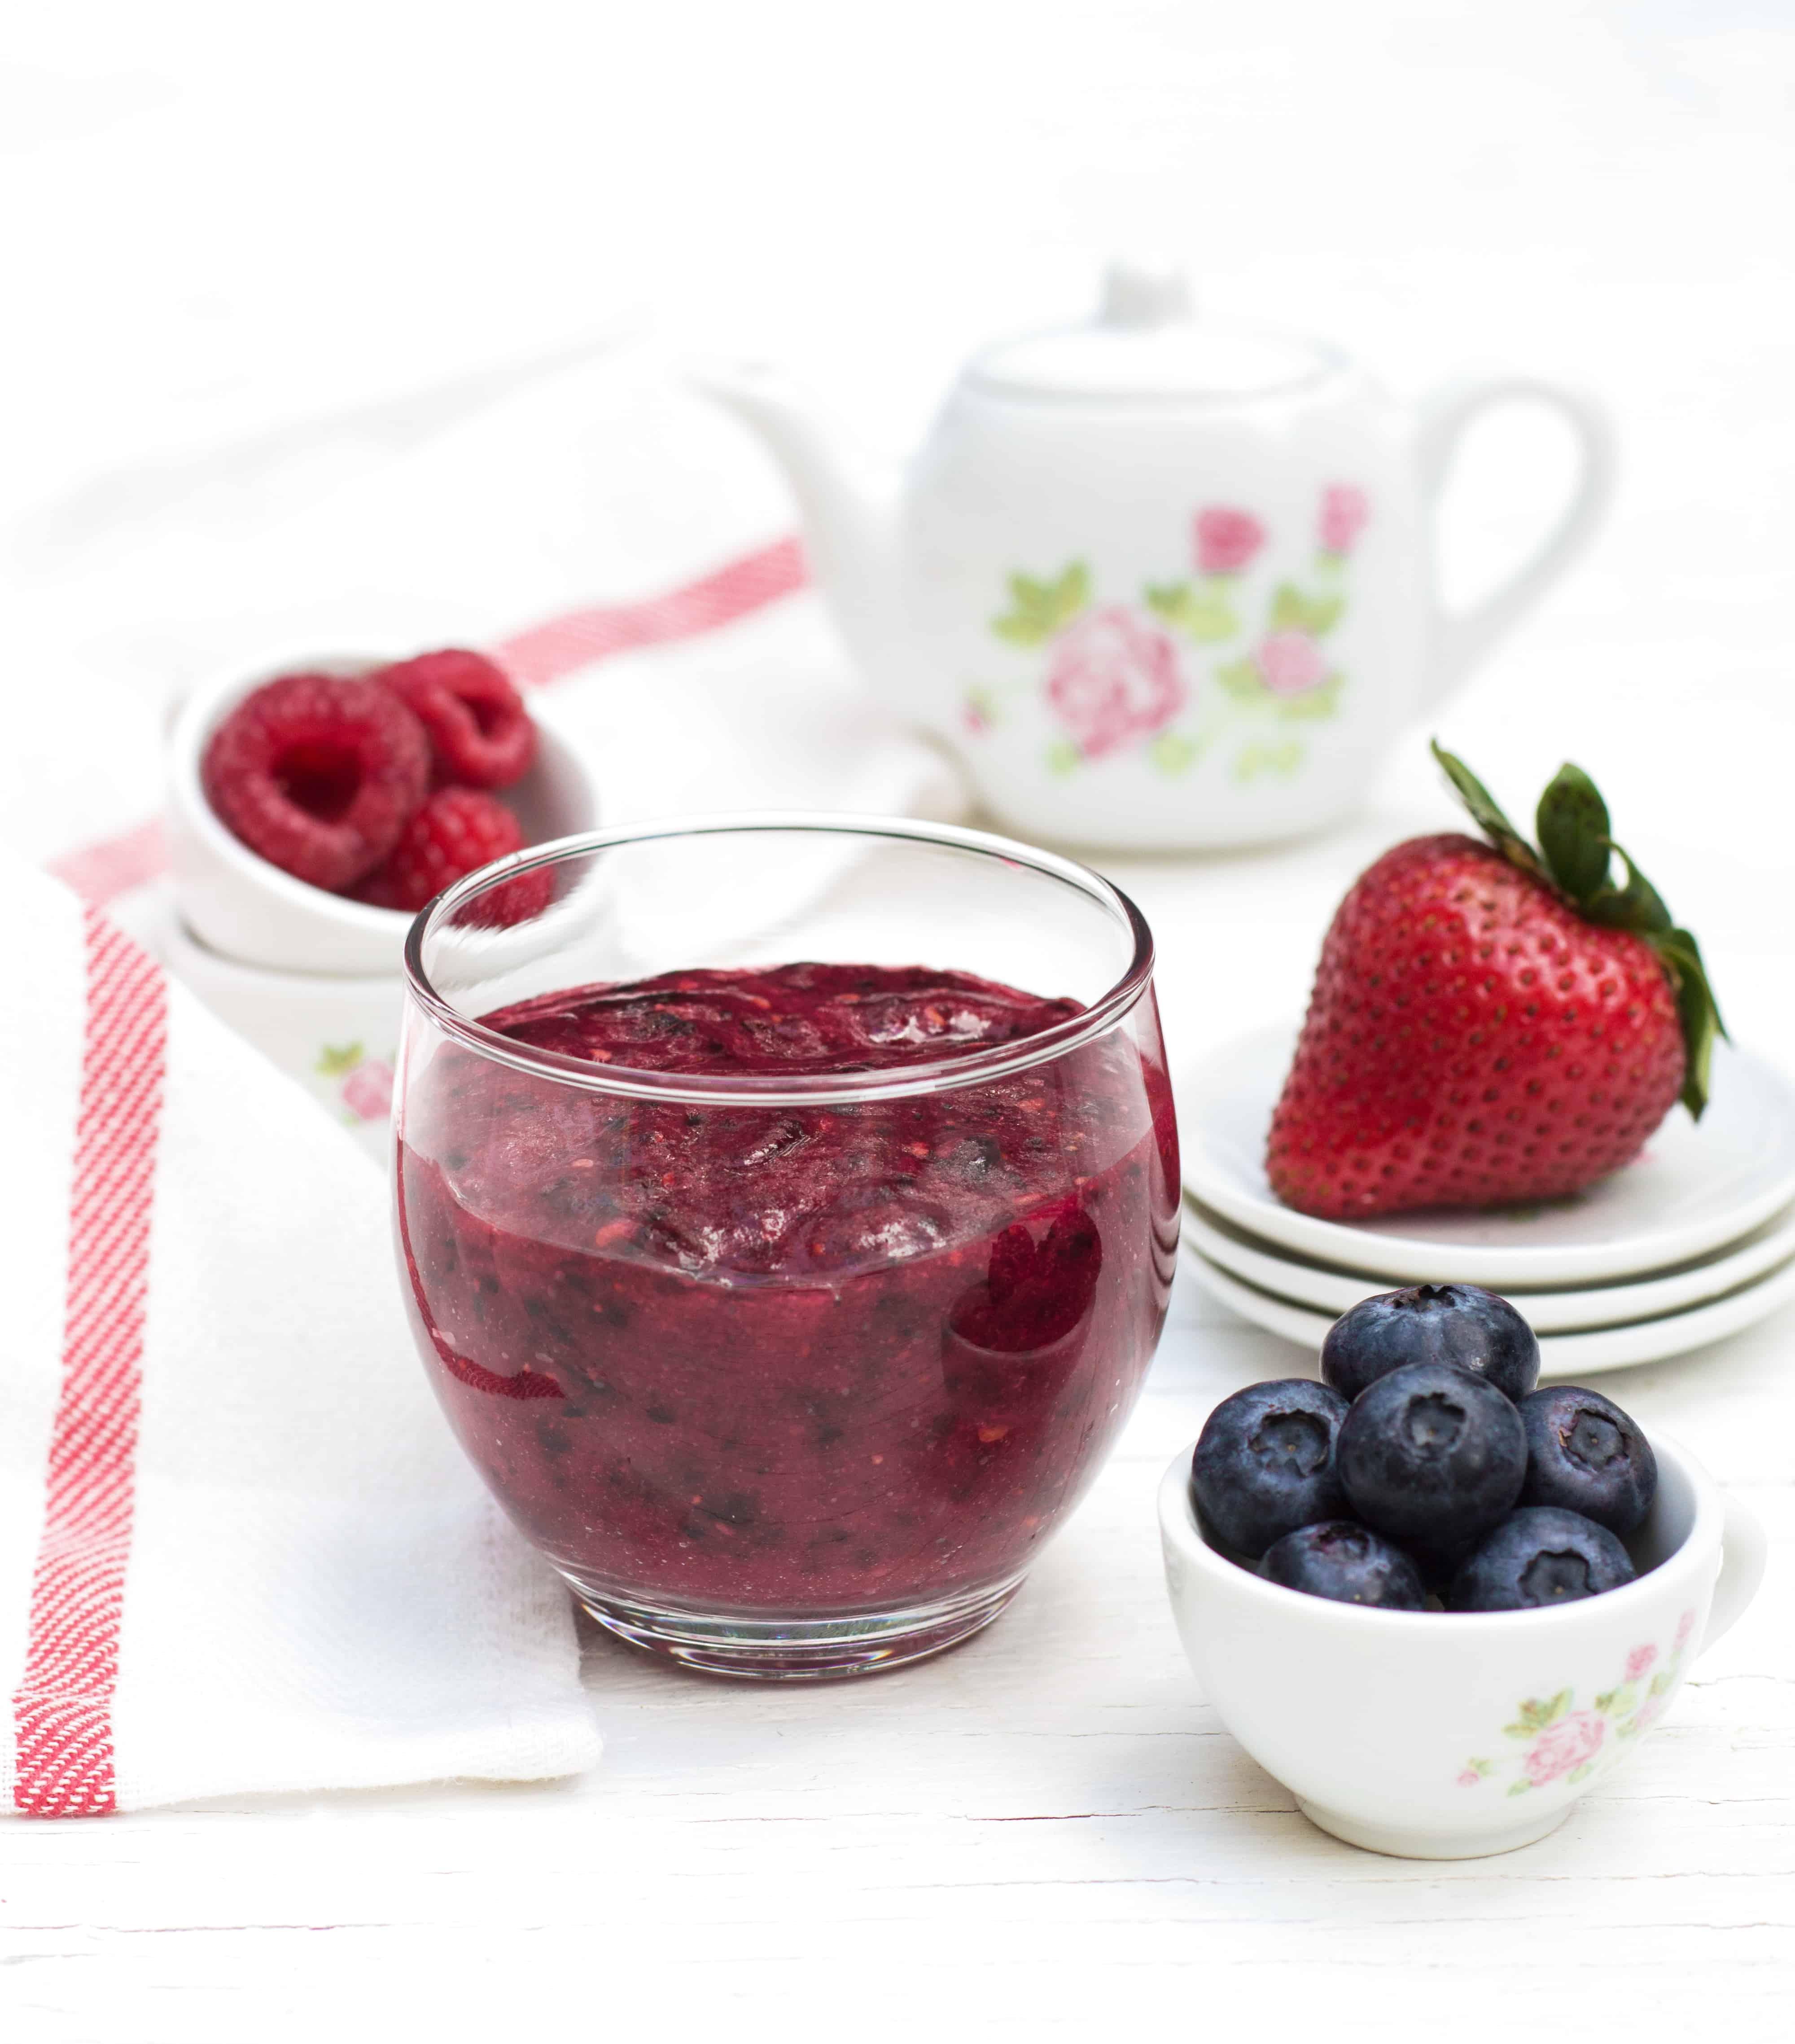 Very Berry Puree - Mixed berry baby food puree recipe